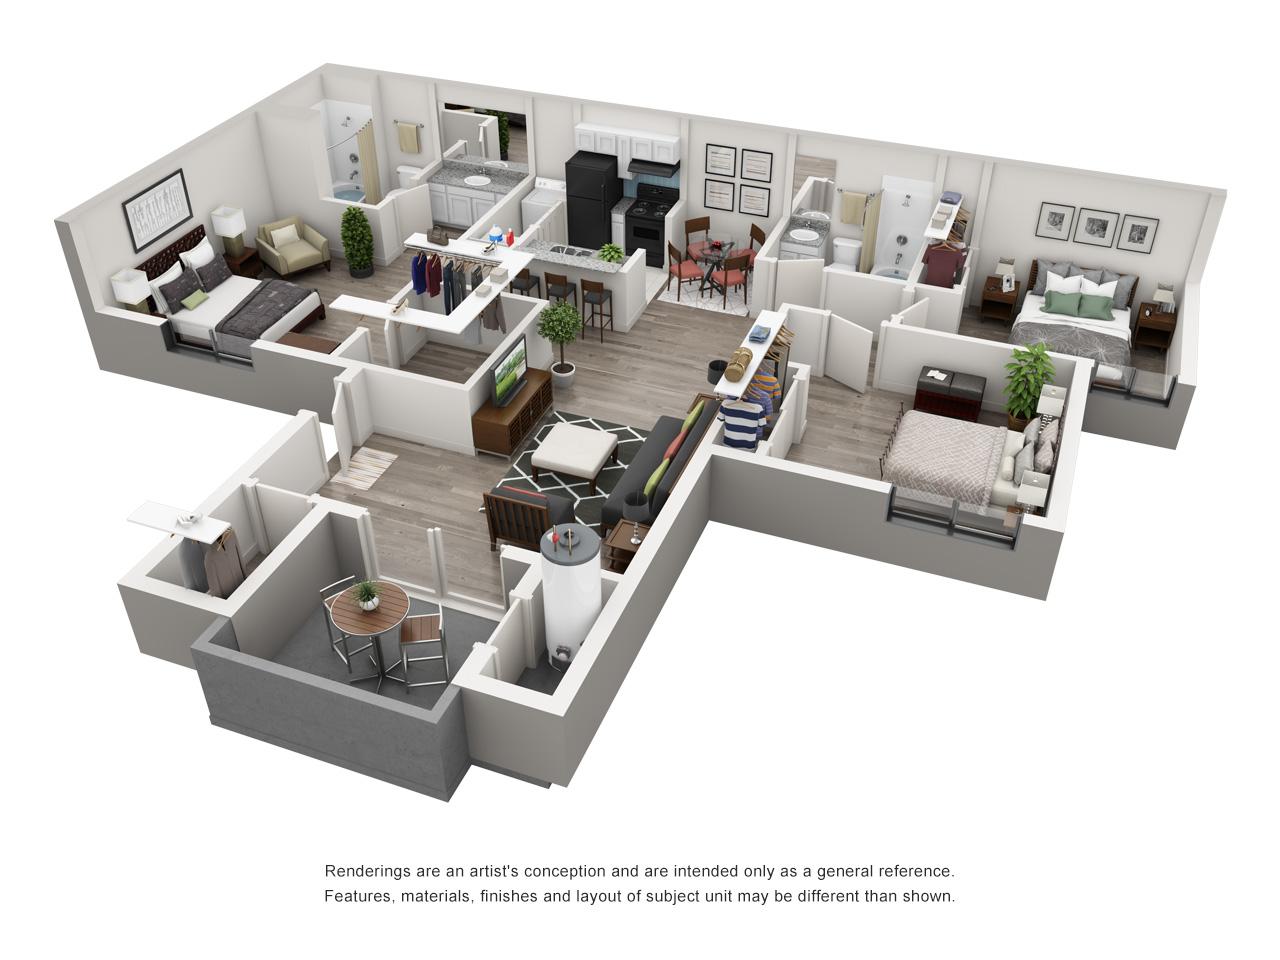 Spacious 3 bedroom apartment at palm canyon apartment homes at palm canyon tucson